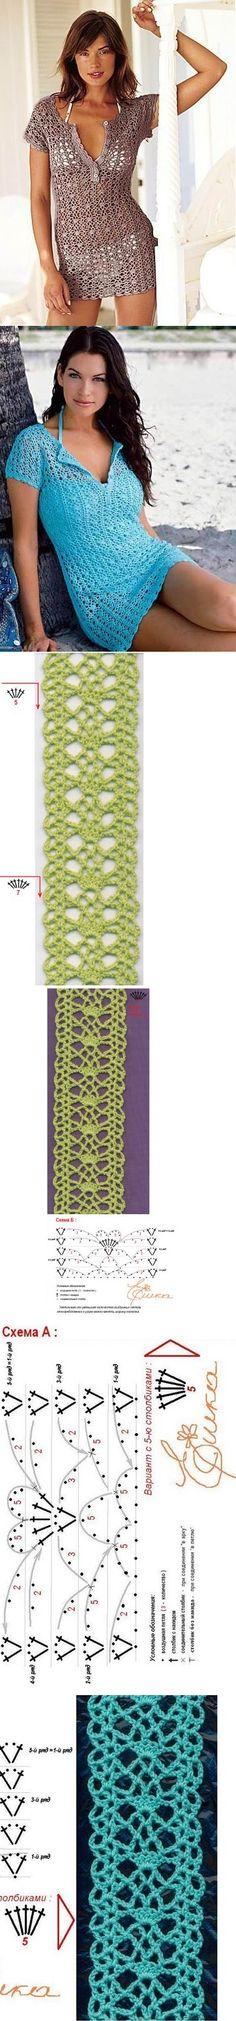 Blusa de crochê (saida de praia)